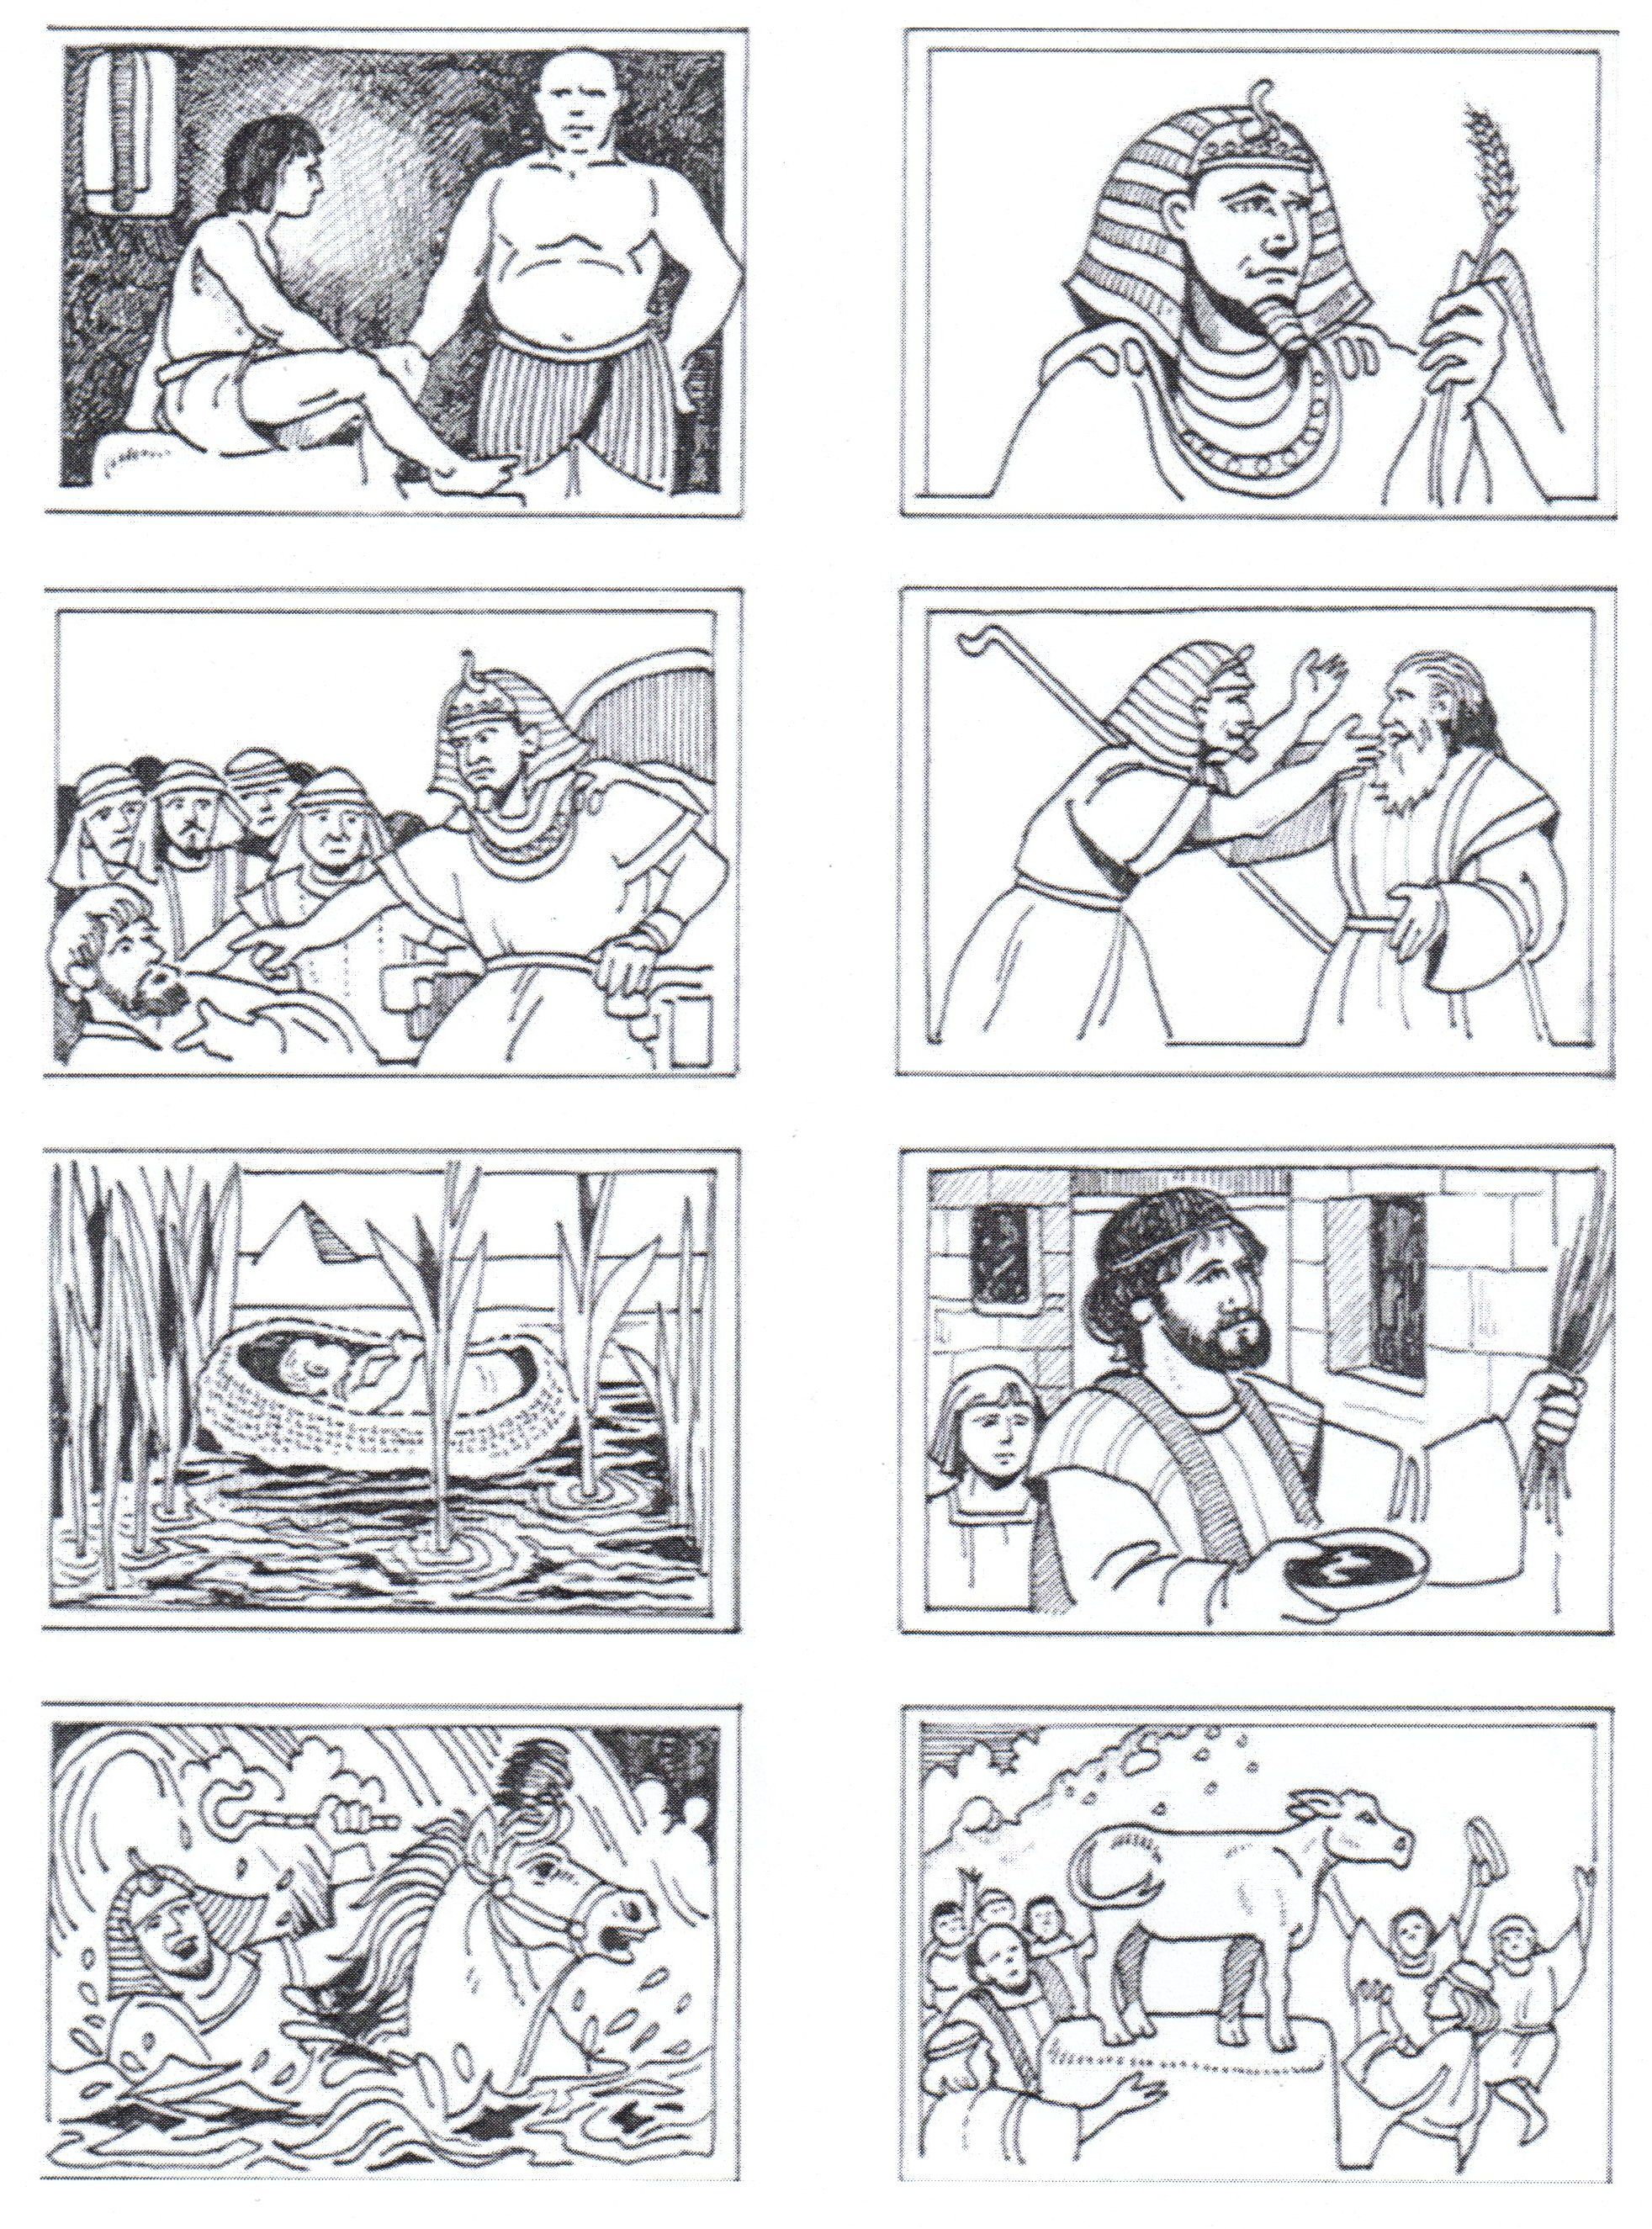 Pin de Heather McCary en Bible OT: Cain & Able   Pinterest   Moises ...